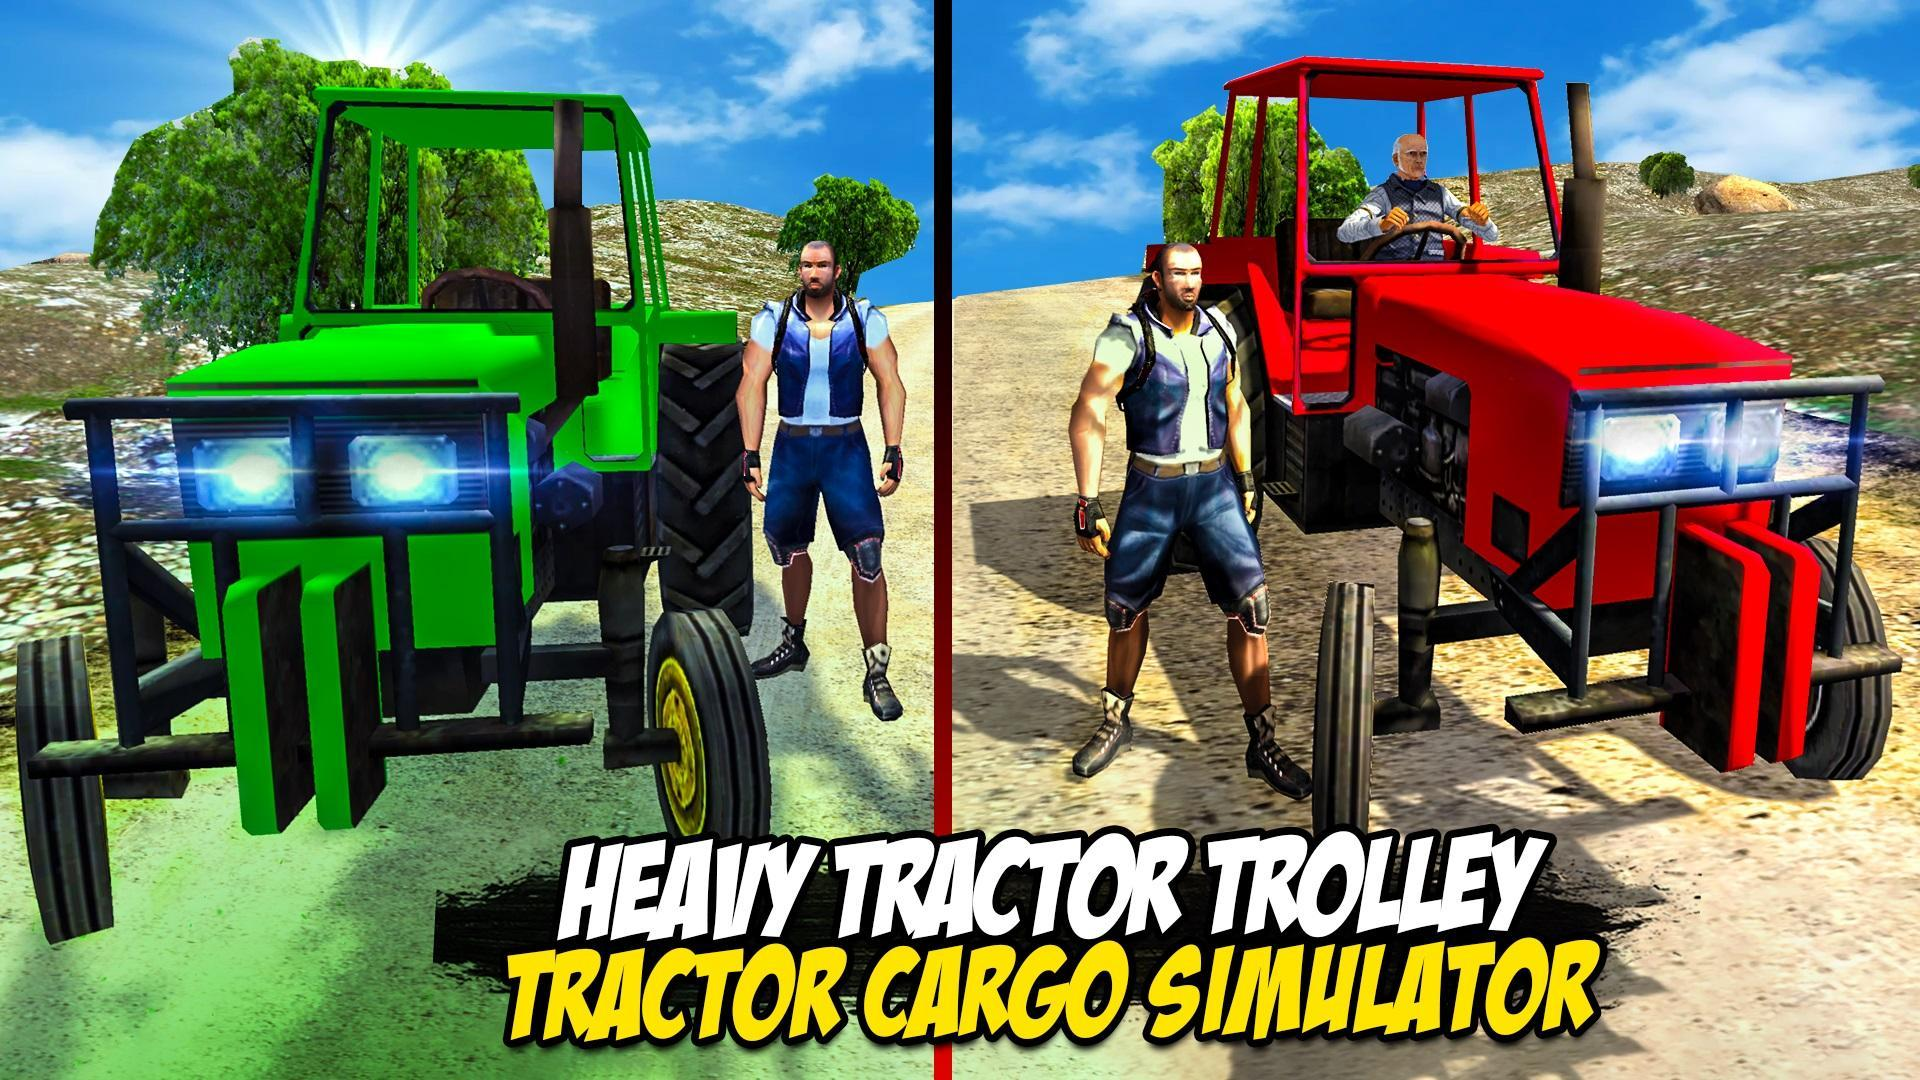 Heavy Tractor Trolley: Tractor Cargo Simulator🚜🚜 3.1 Screenshot 1